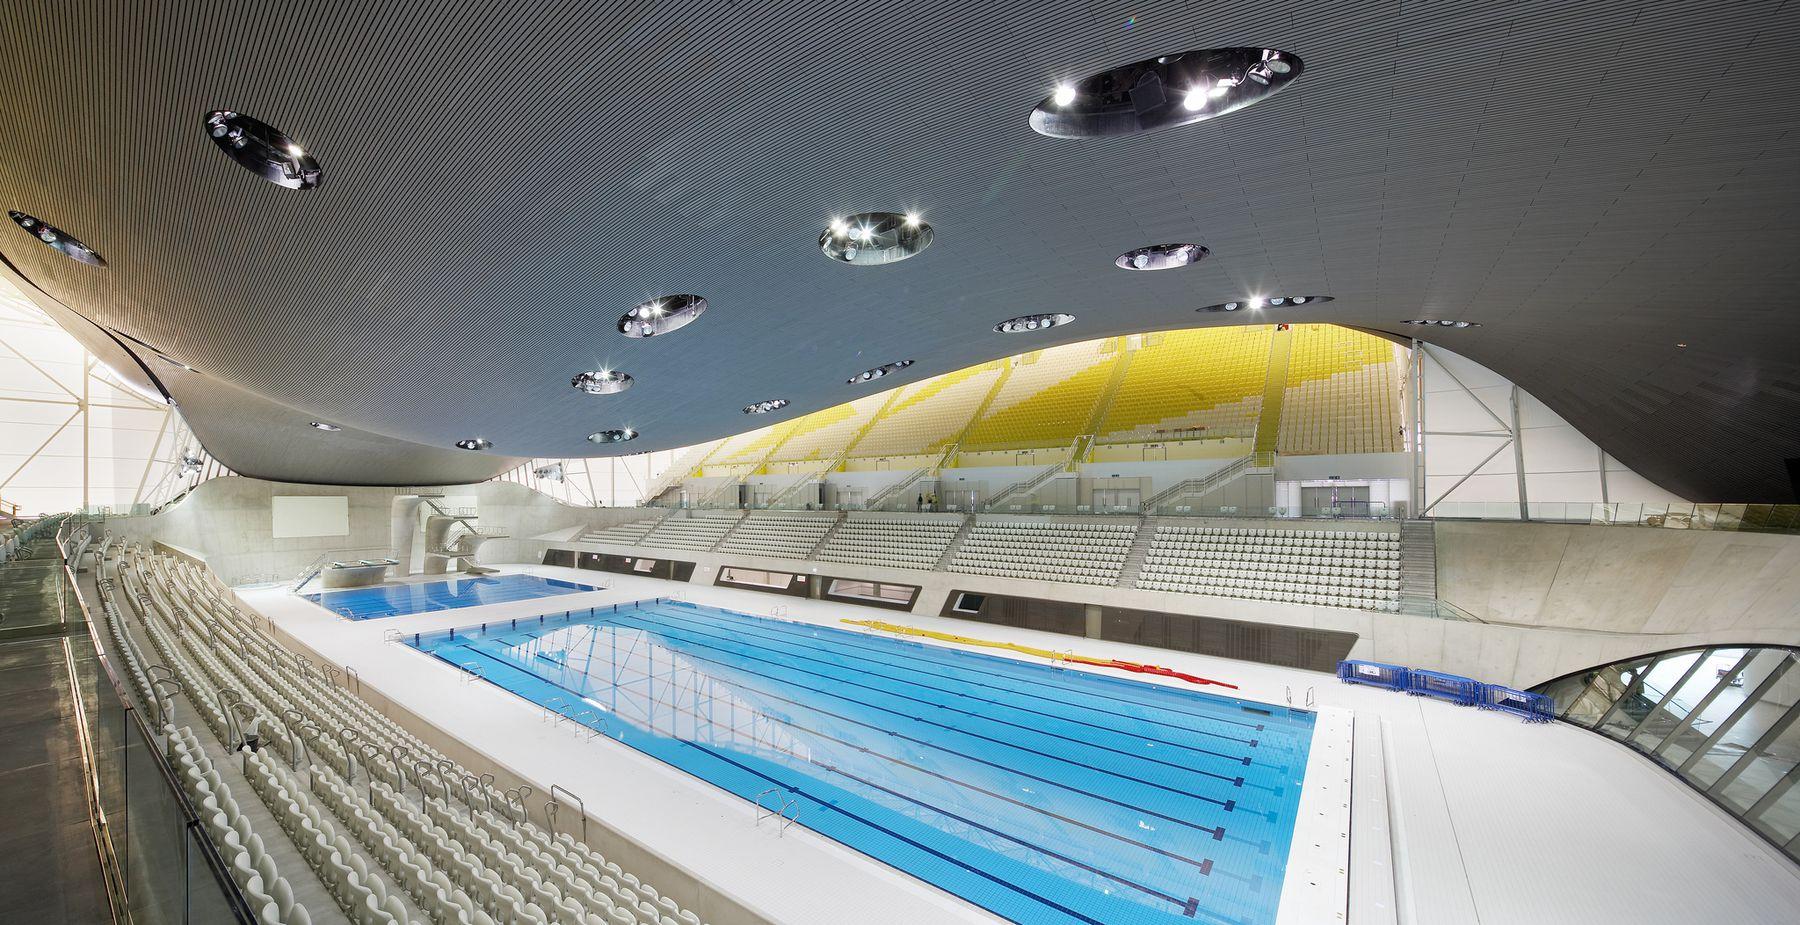 London Aquatics Centre for the 2012 Summer Olympics in London, England, 2011 Photo via Flickr/Creative Commons